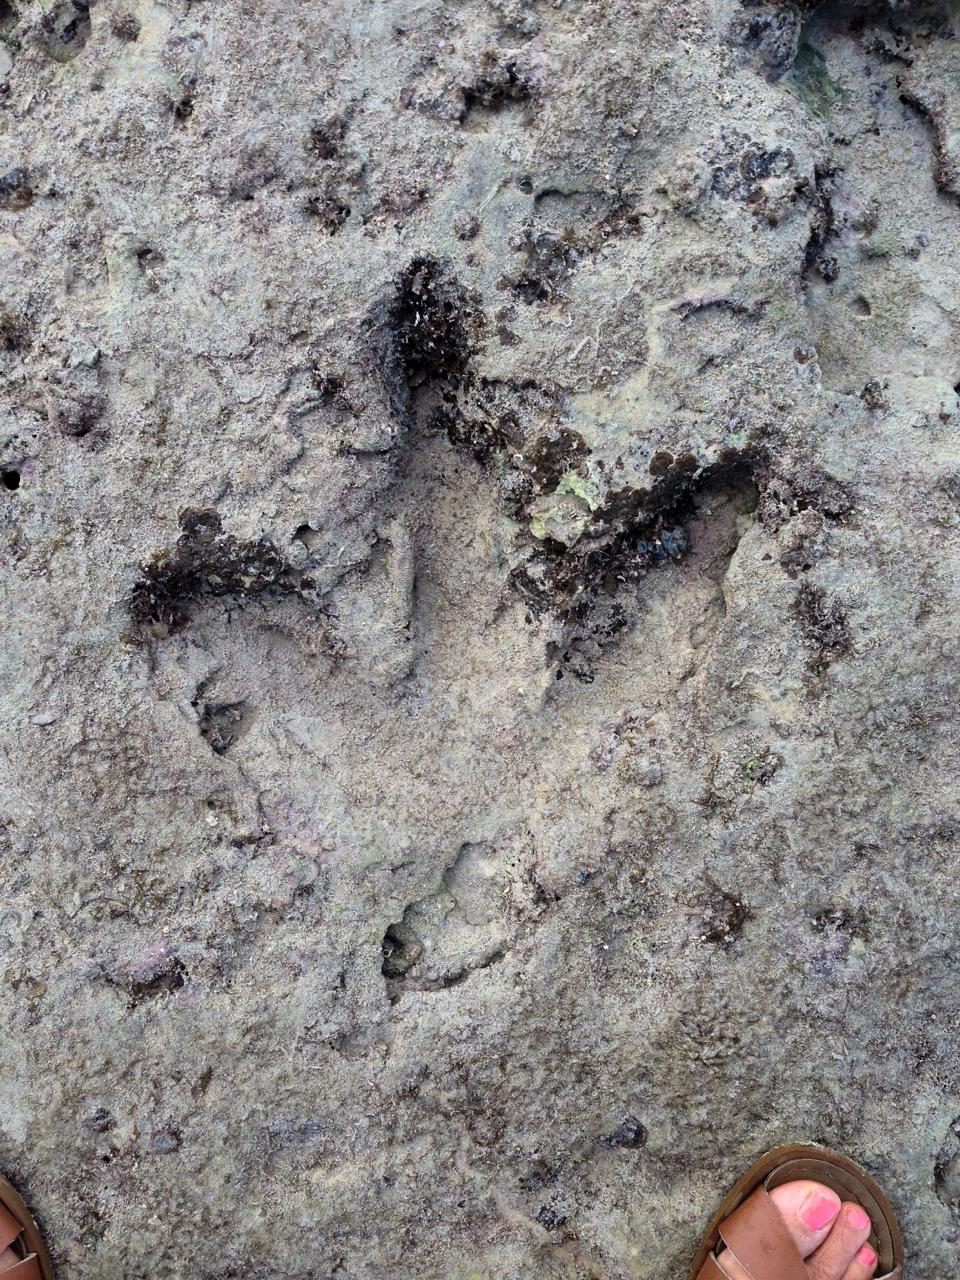 Dinosaur footprint at Gantheume Point